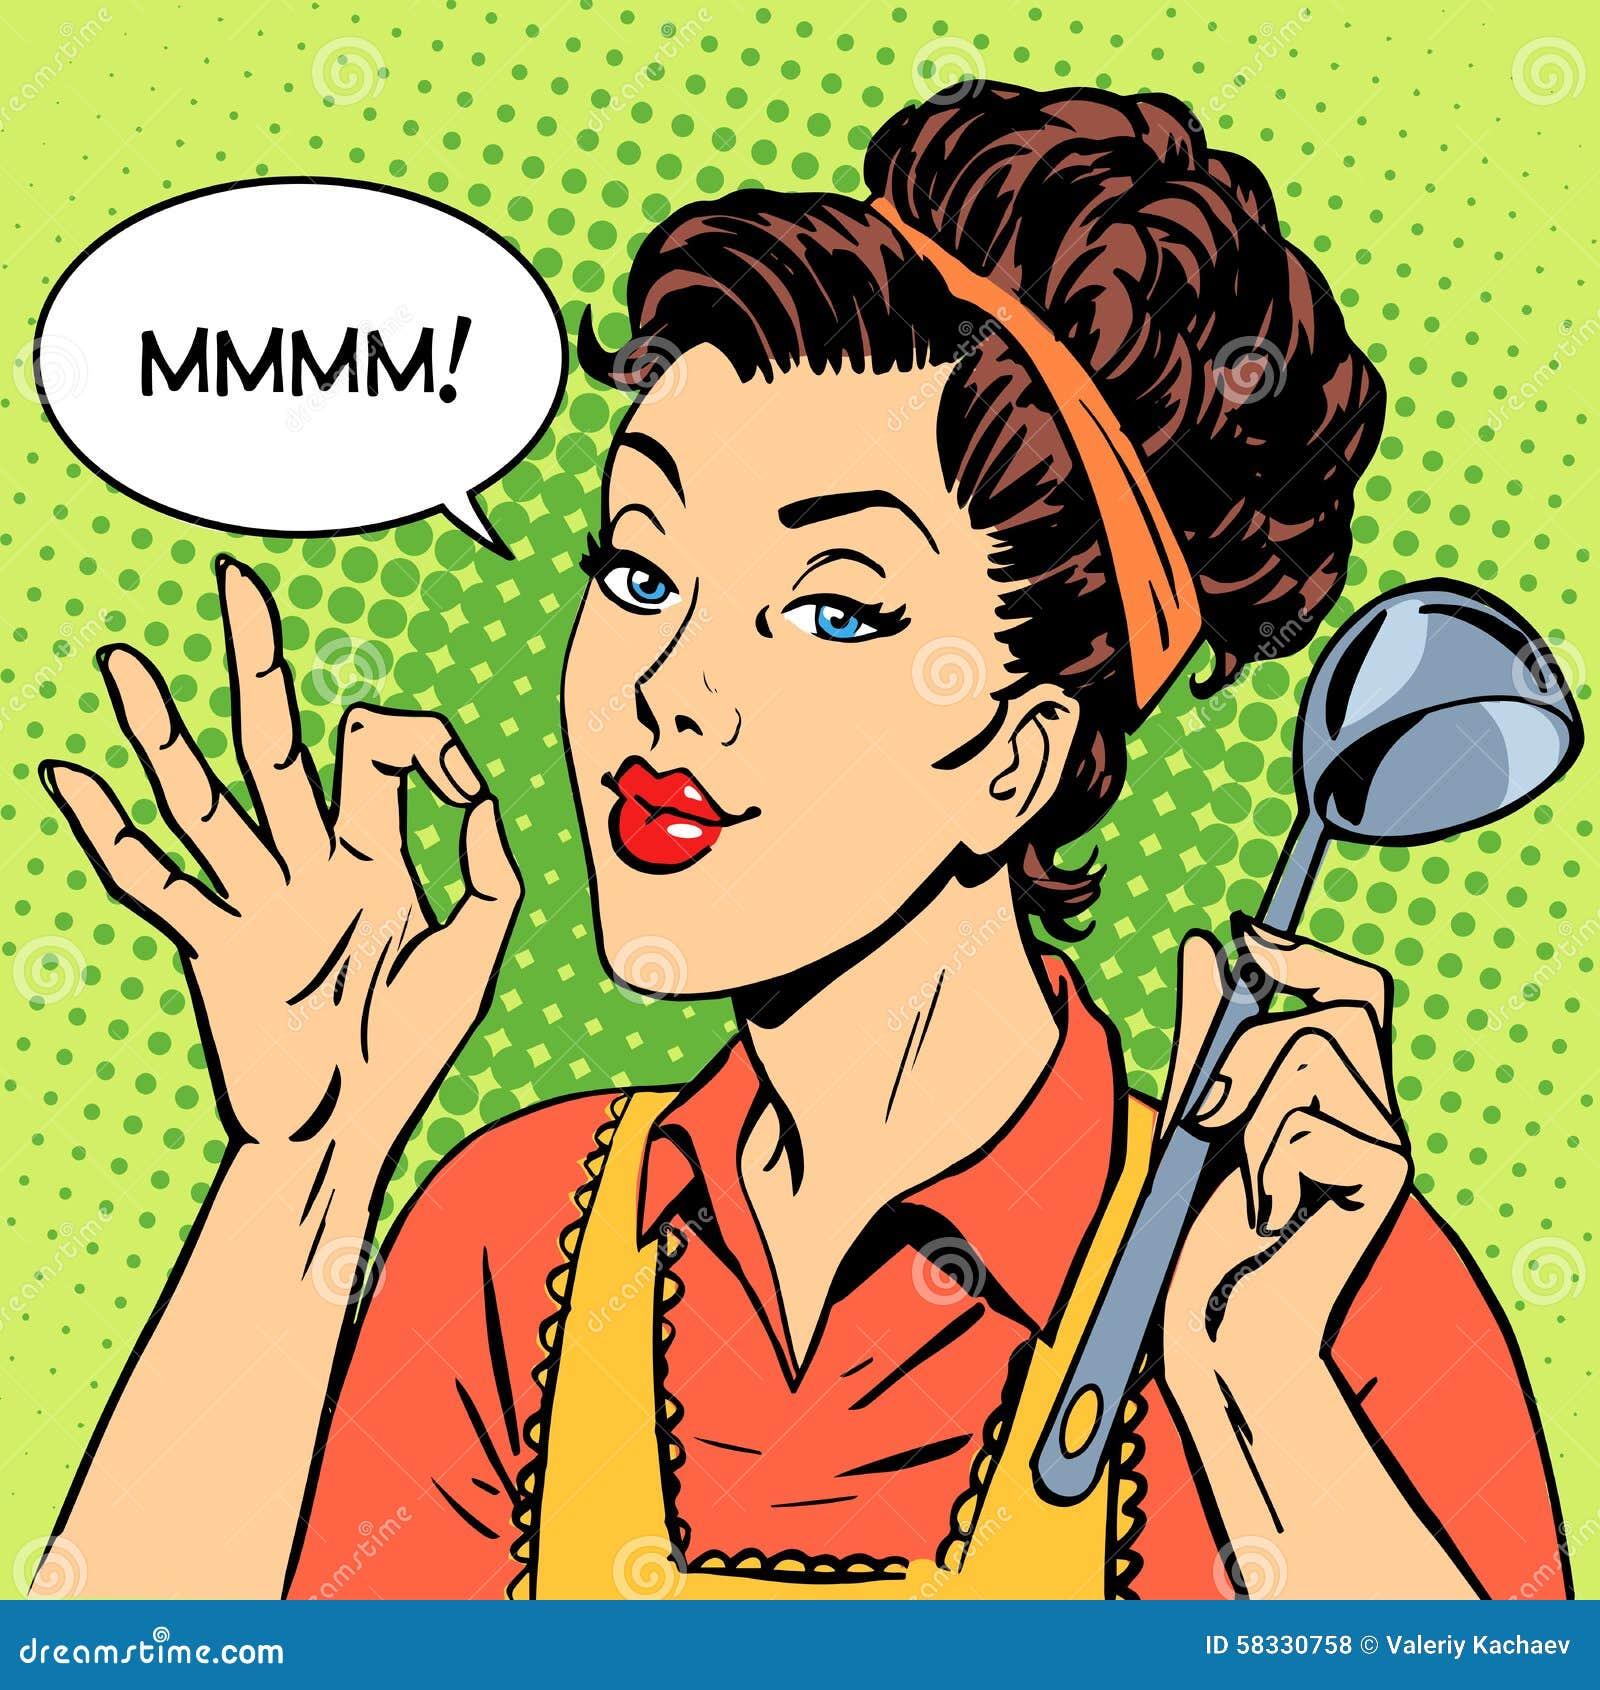 Retro Kitchen Illustration: Woman Tasty Dish Cooking Stock Illustration. Illustration Of Thought